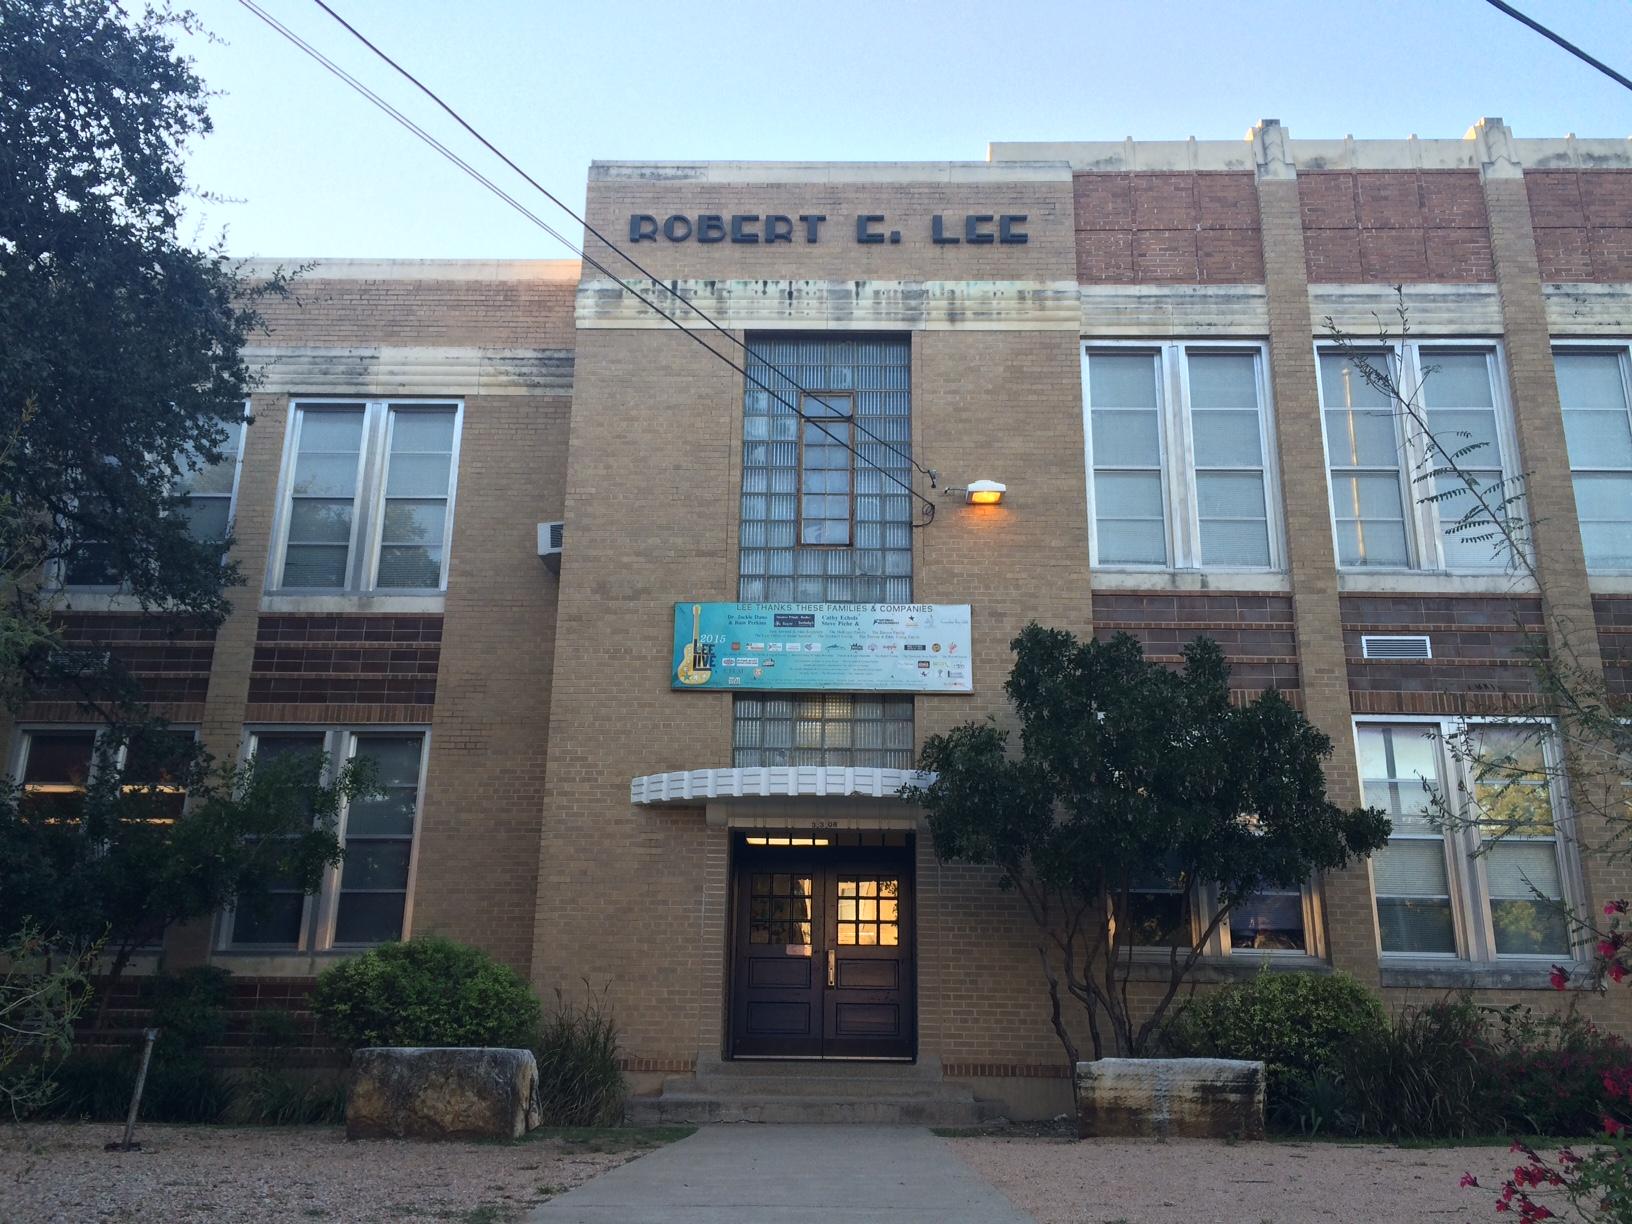 Robert E. Lee Elementary School_196700